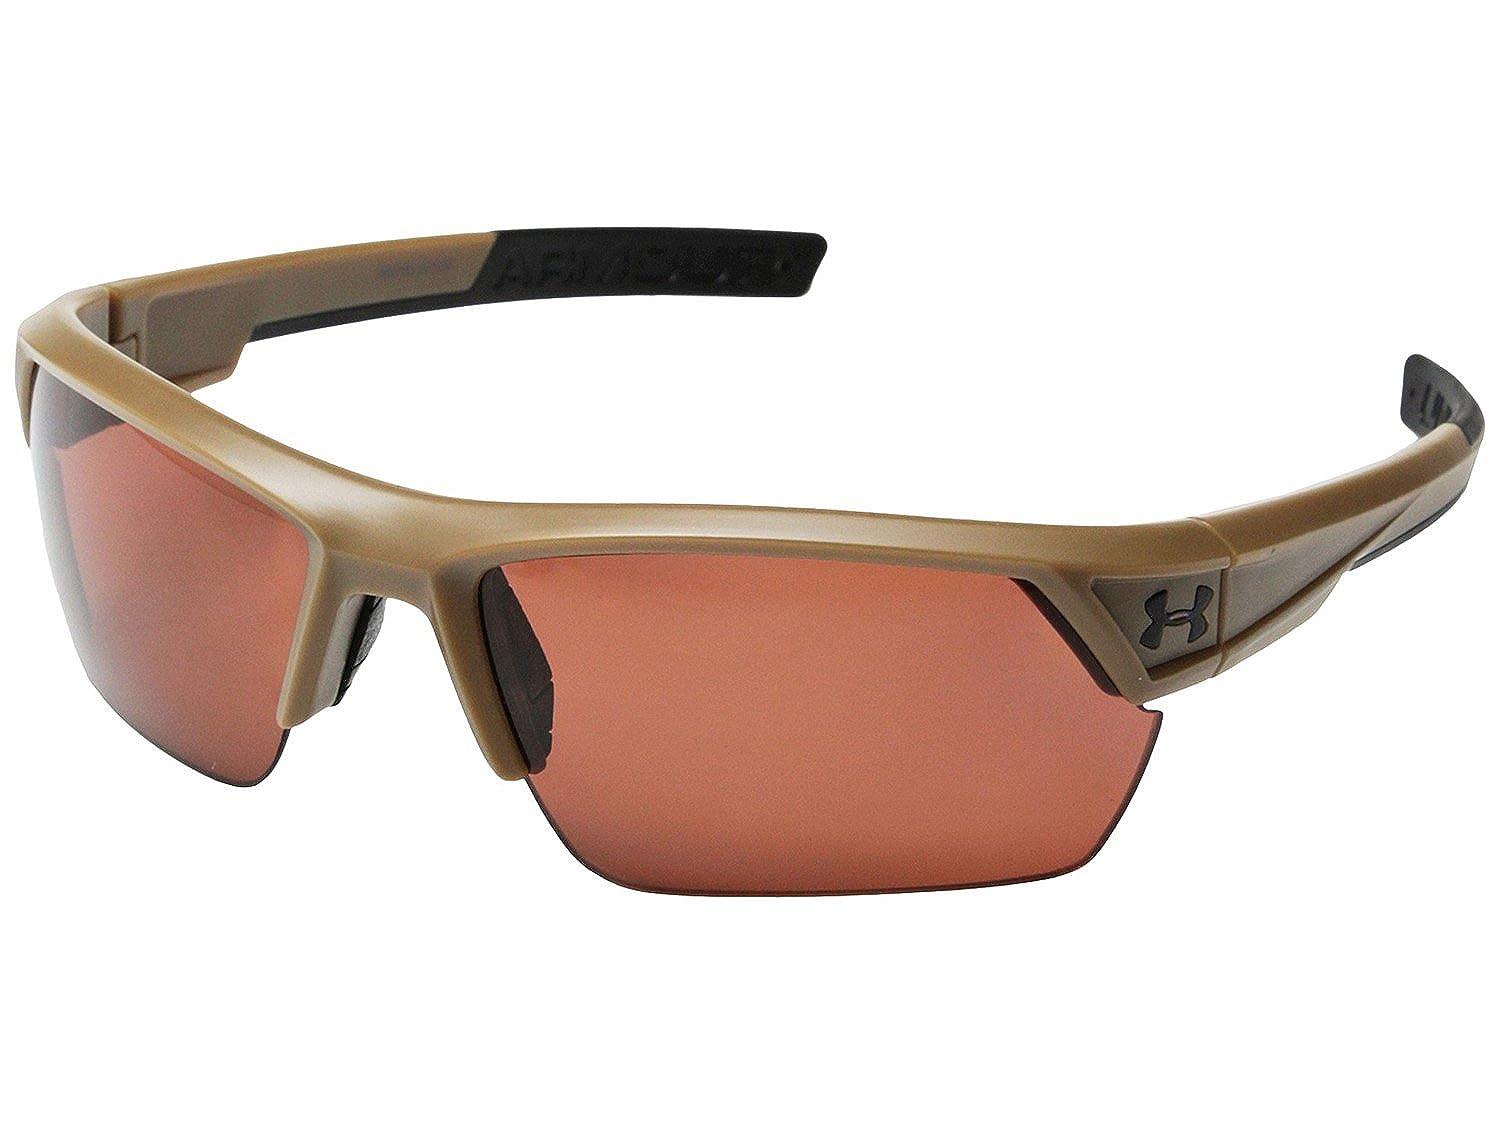 33a17c278cc5 Under Armour UA Igniter 2.0 Polarized Sunglasses Satin Brown, Brown  Multiflection Storm ANSI Z87.1: Amazon.co.uk: Clothing